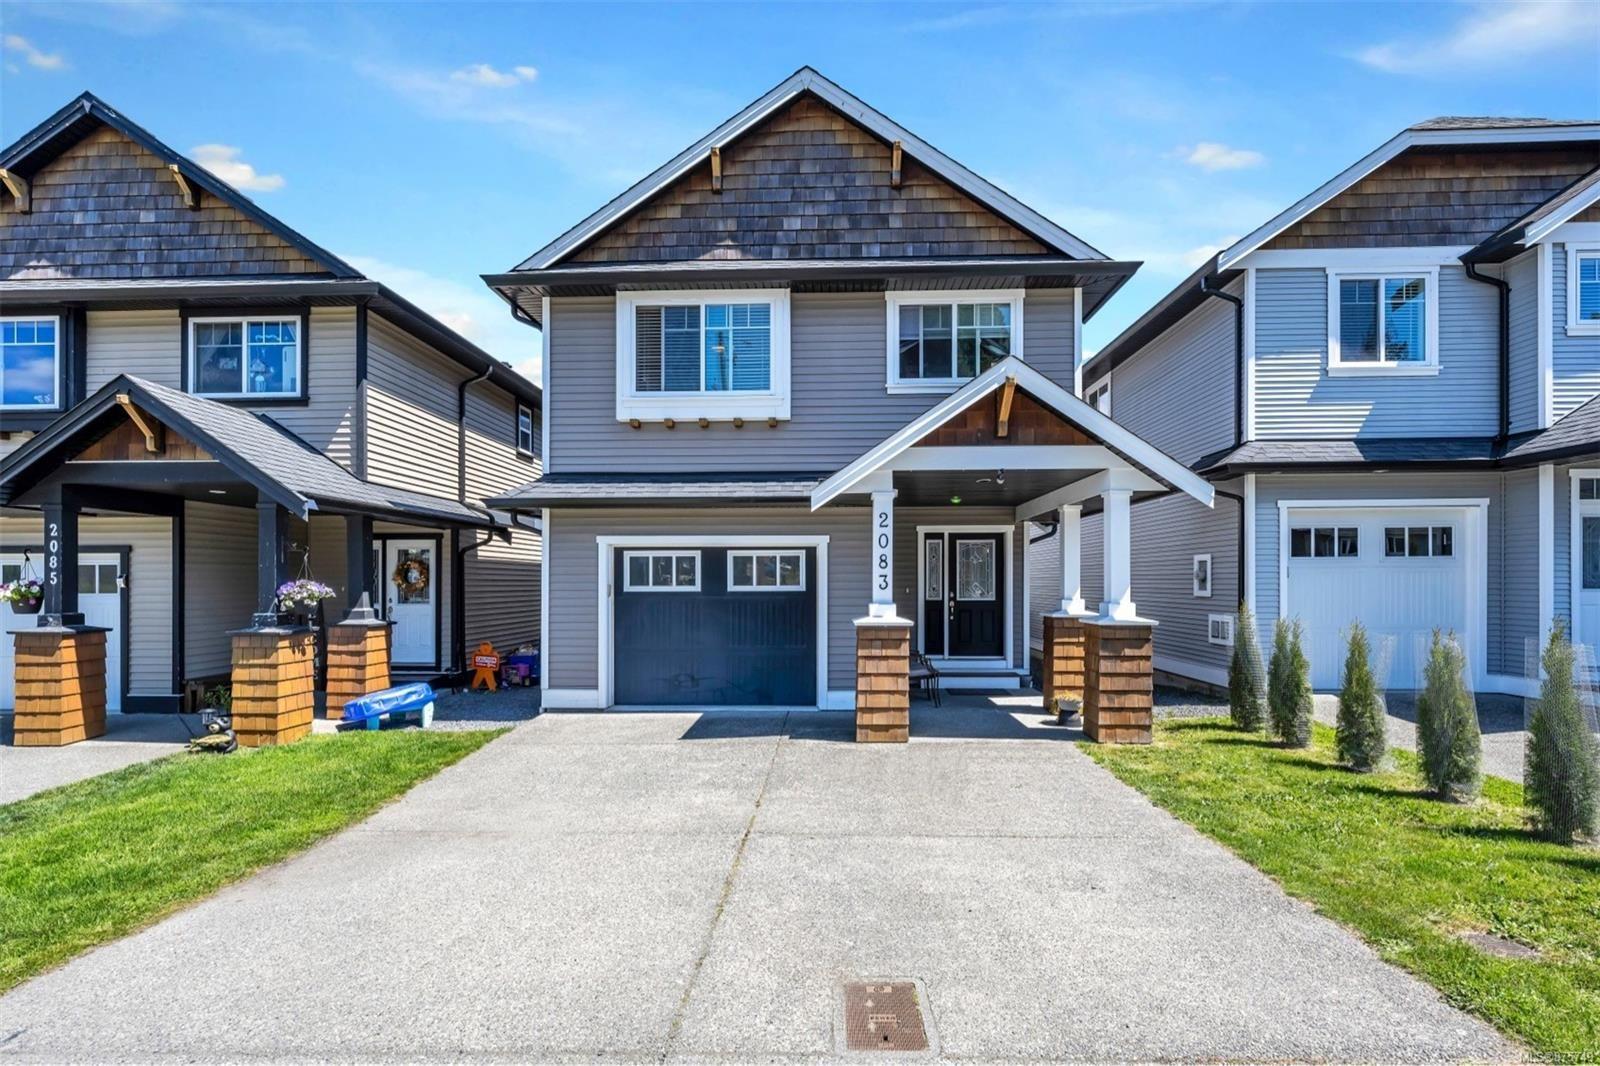 Main Photo: 2083 Dover St in Sooke: Sk Sooke Vill Core House for sale : MLS®# 875749